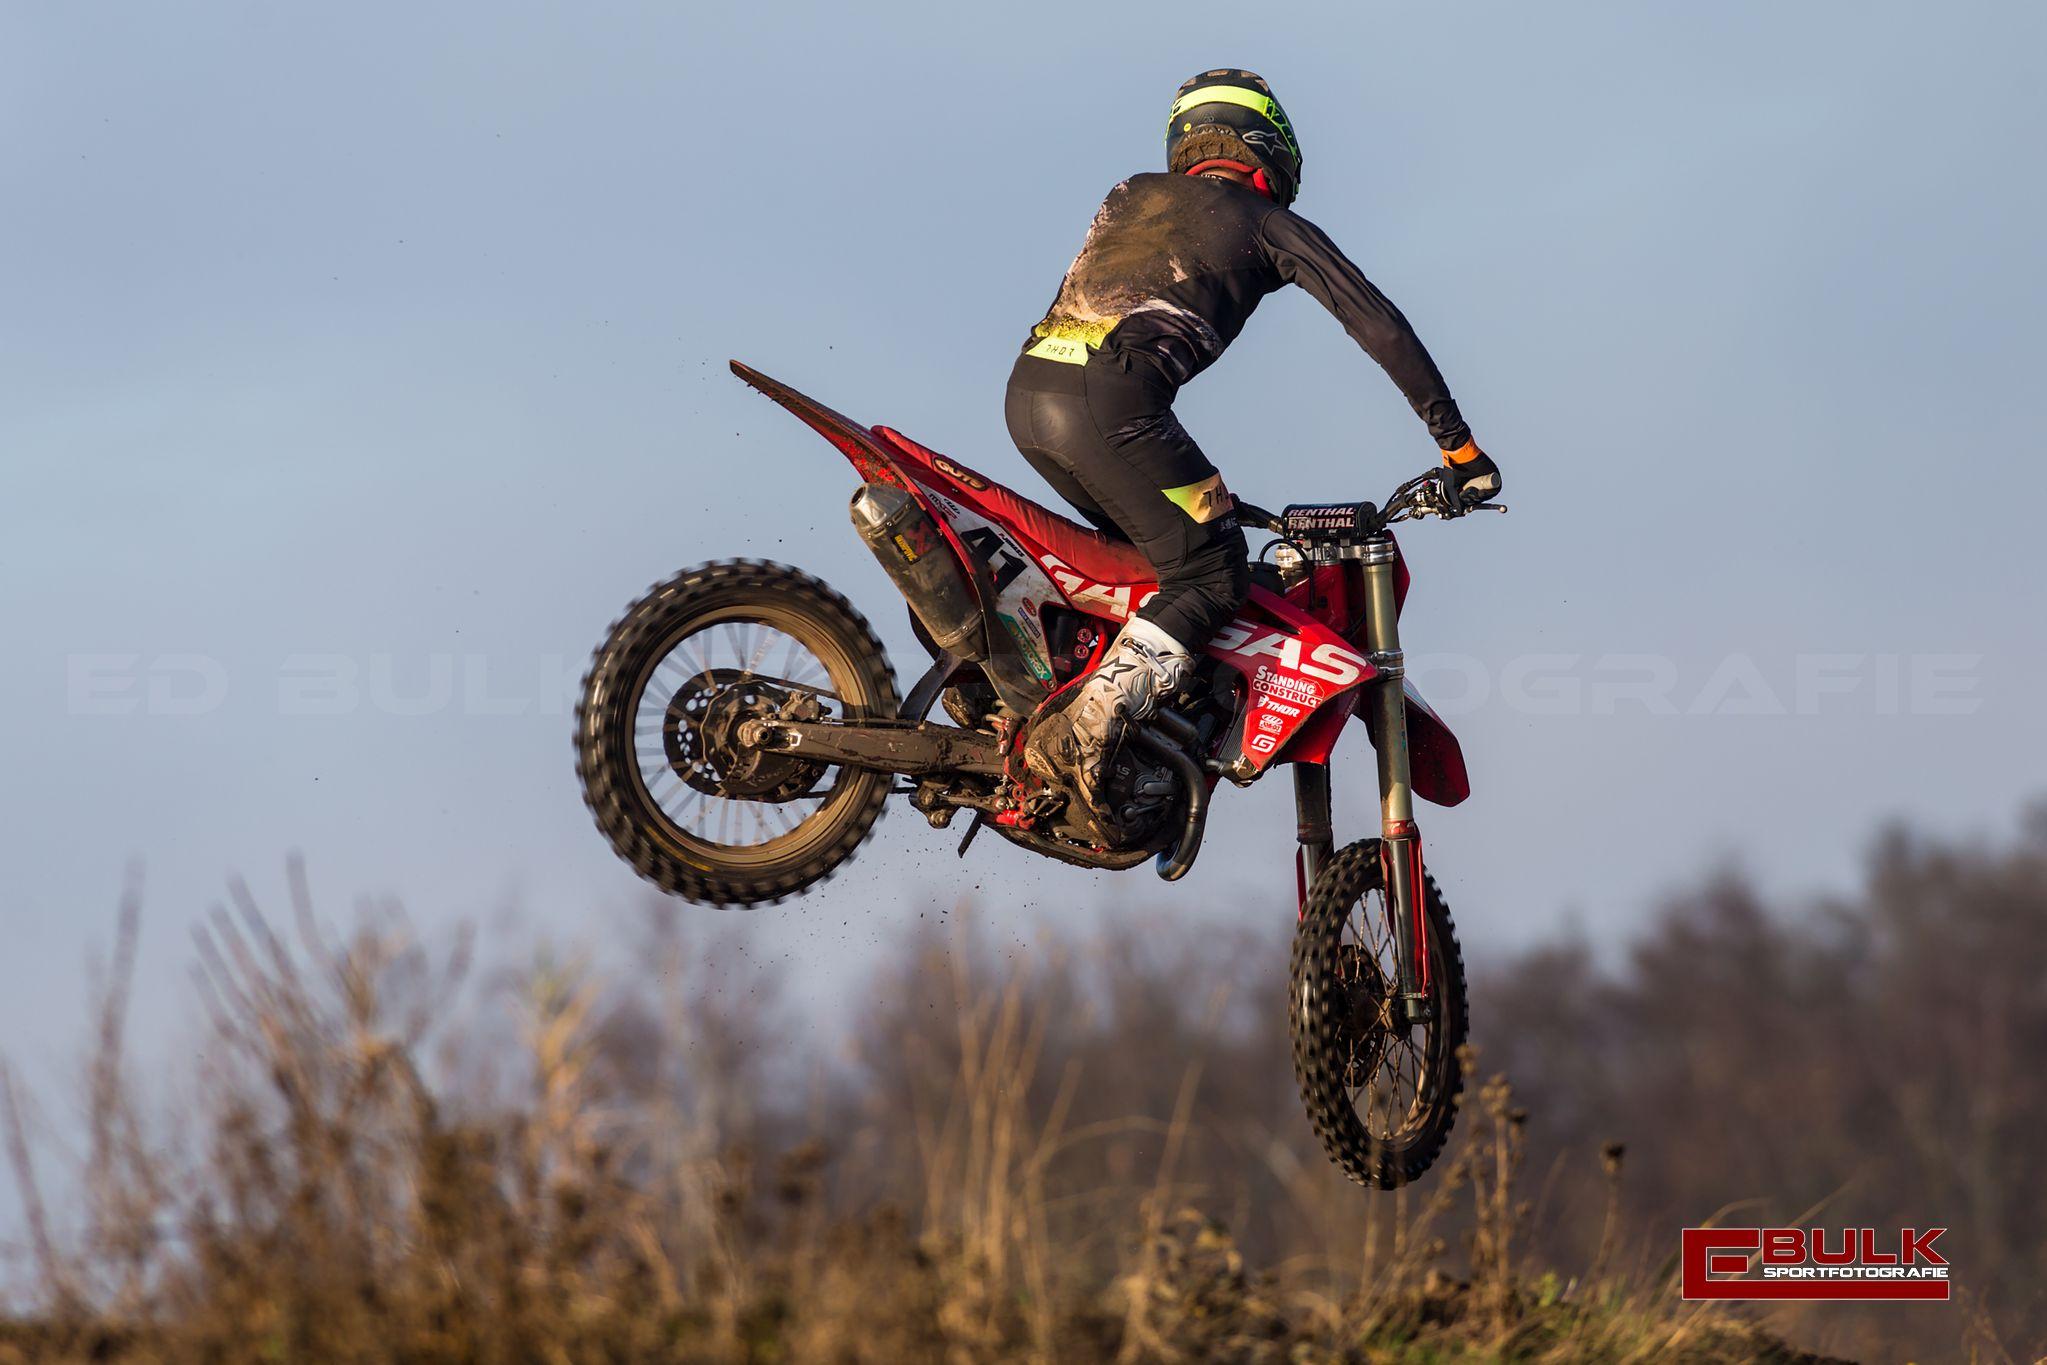 eebs2196-ed_bulk_sportfotografie